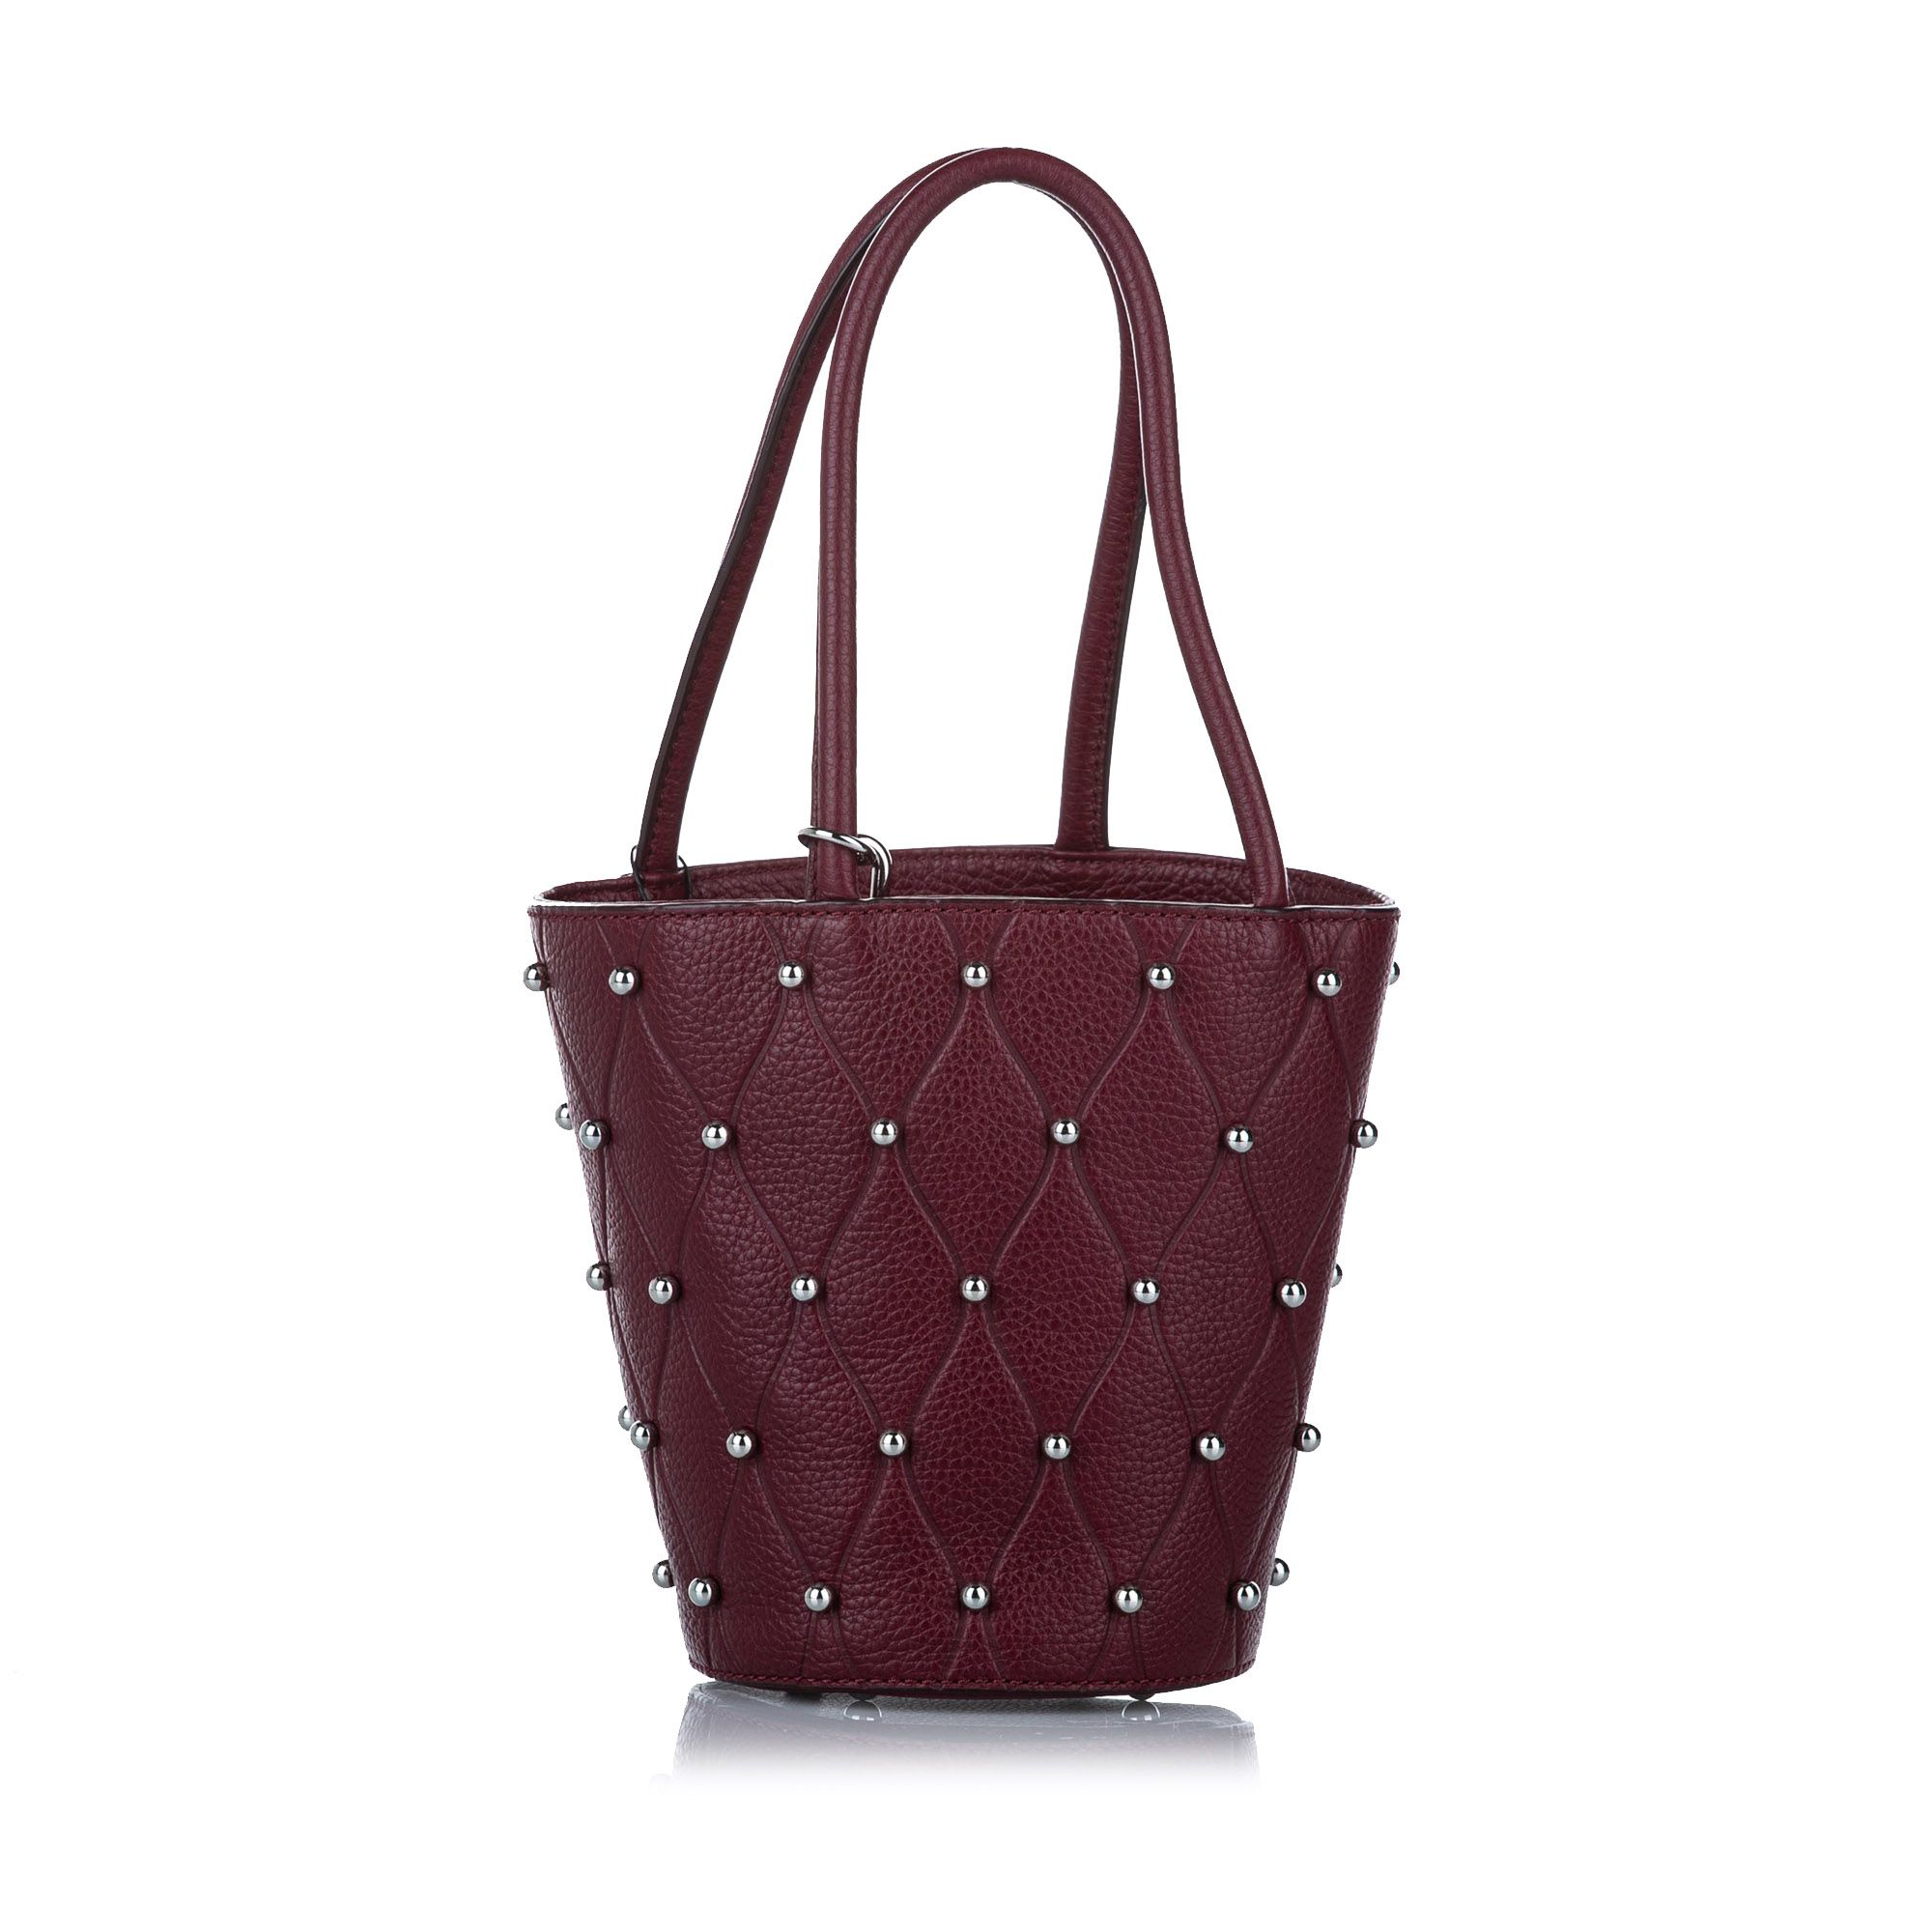 Vintage Alexander Wang Roxy Studded Leather Bucket Bag Red